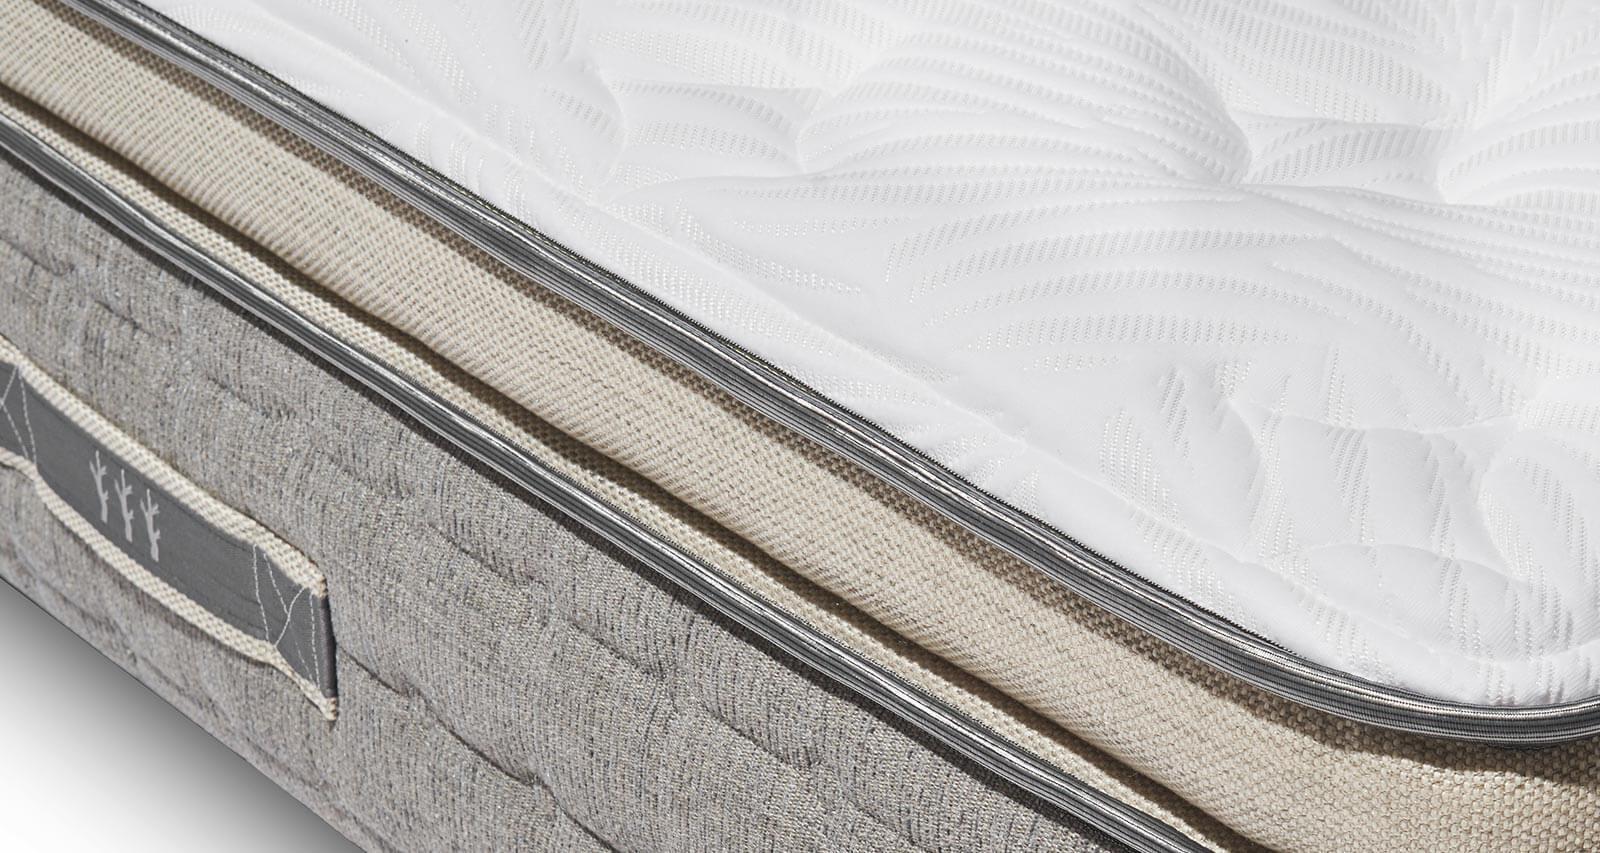 Brentwood Home Coronado Memory Foam Mattress Review, brentwood home mattress reviews